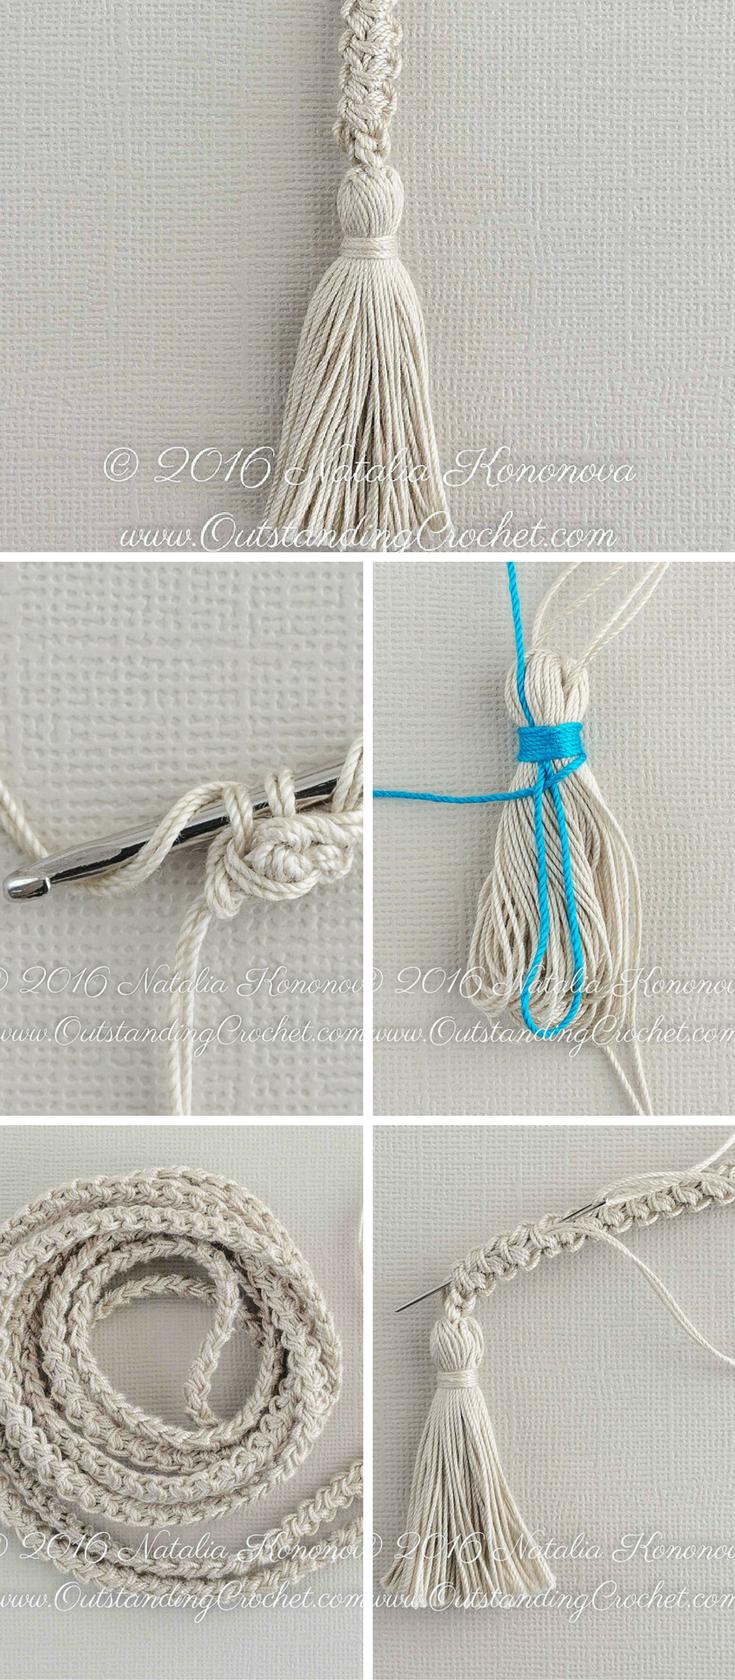 Free Crochet Tutorial - Romanian Cord Drawstring with Tassels ...